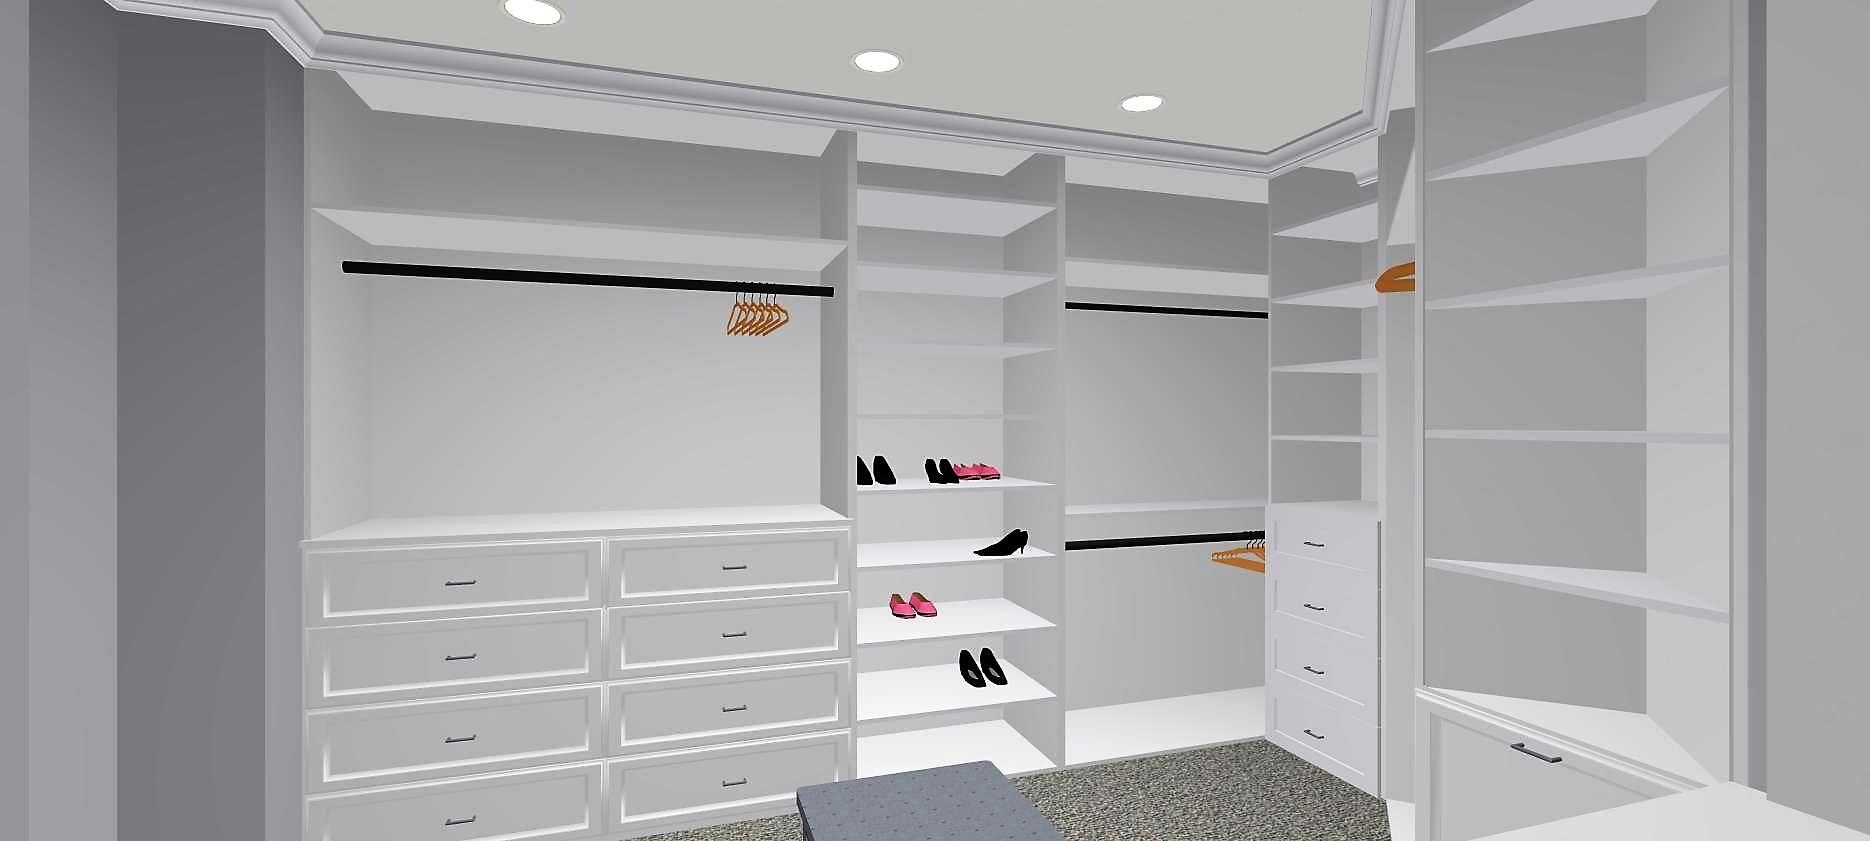 master closet 1 wall.jpg